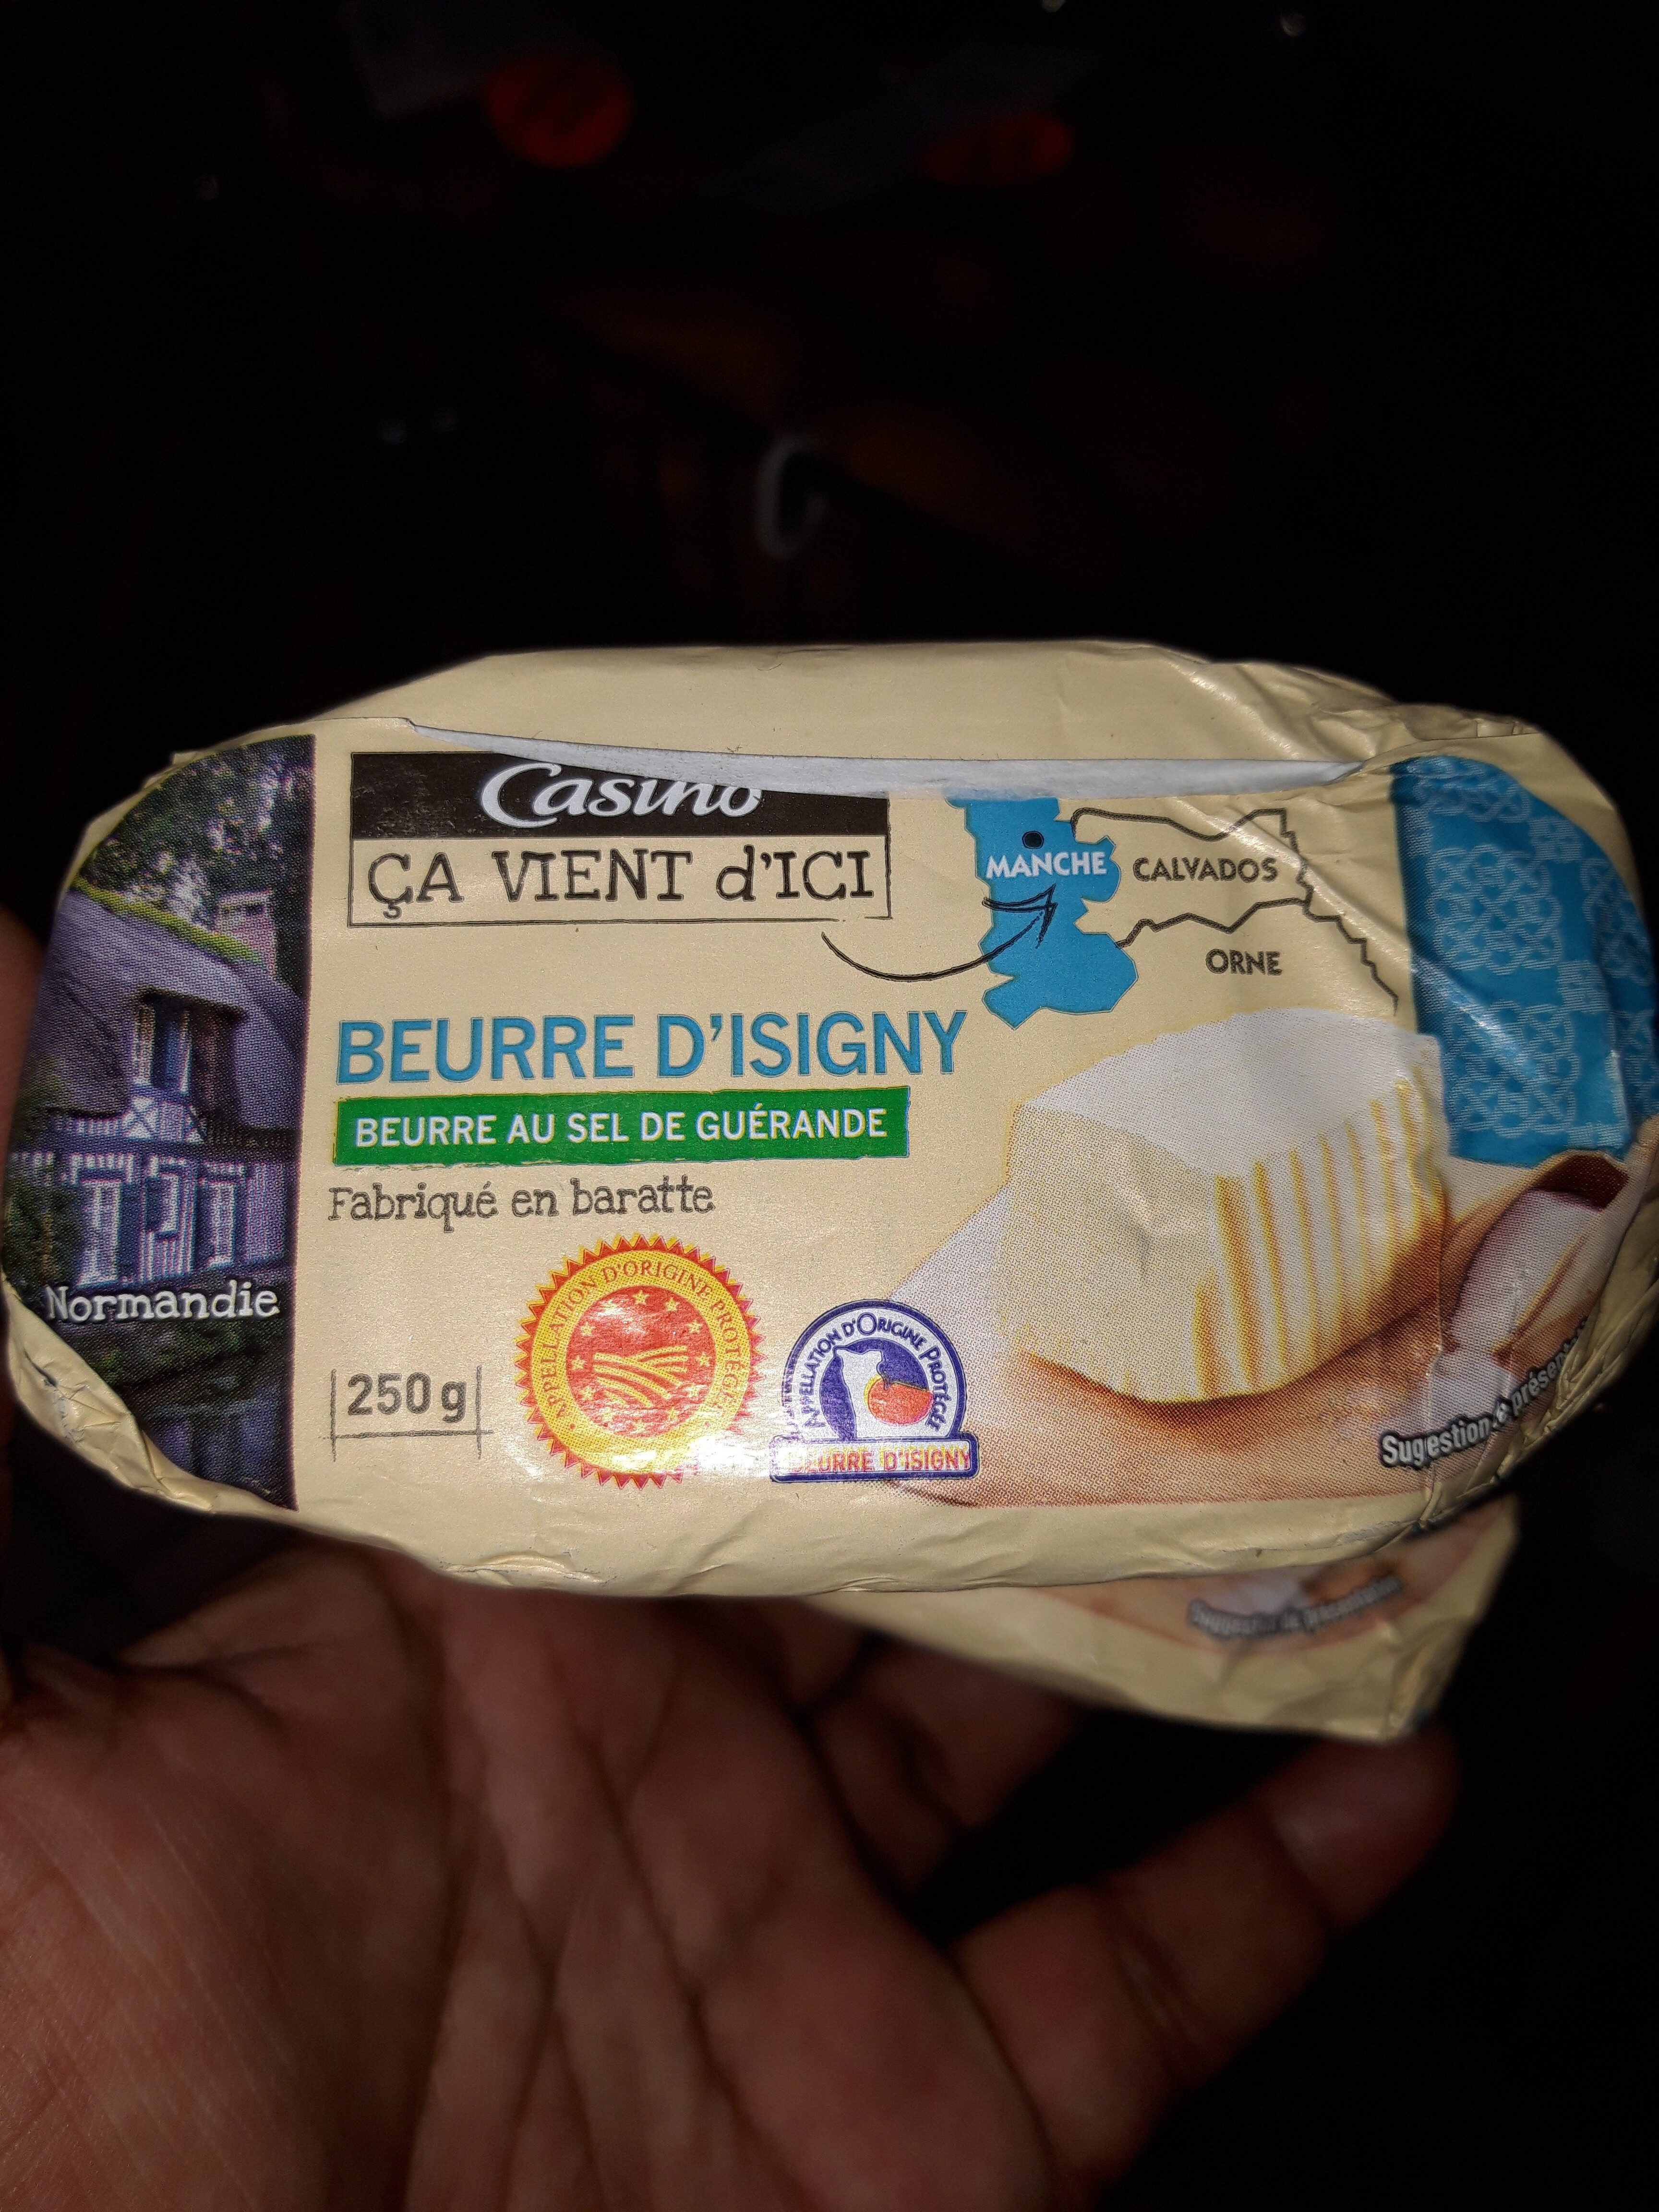 Beuure d'Isigny beurre au sel de Guérande - Product - fr